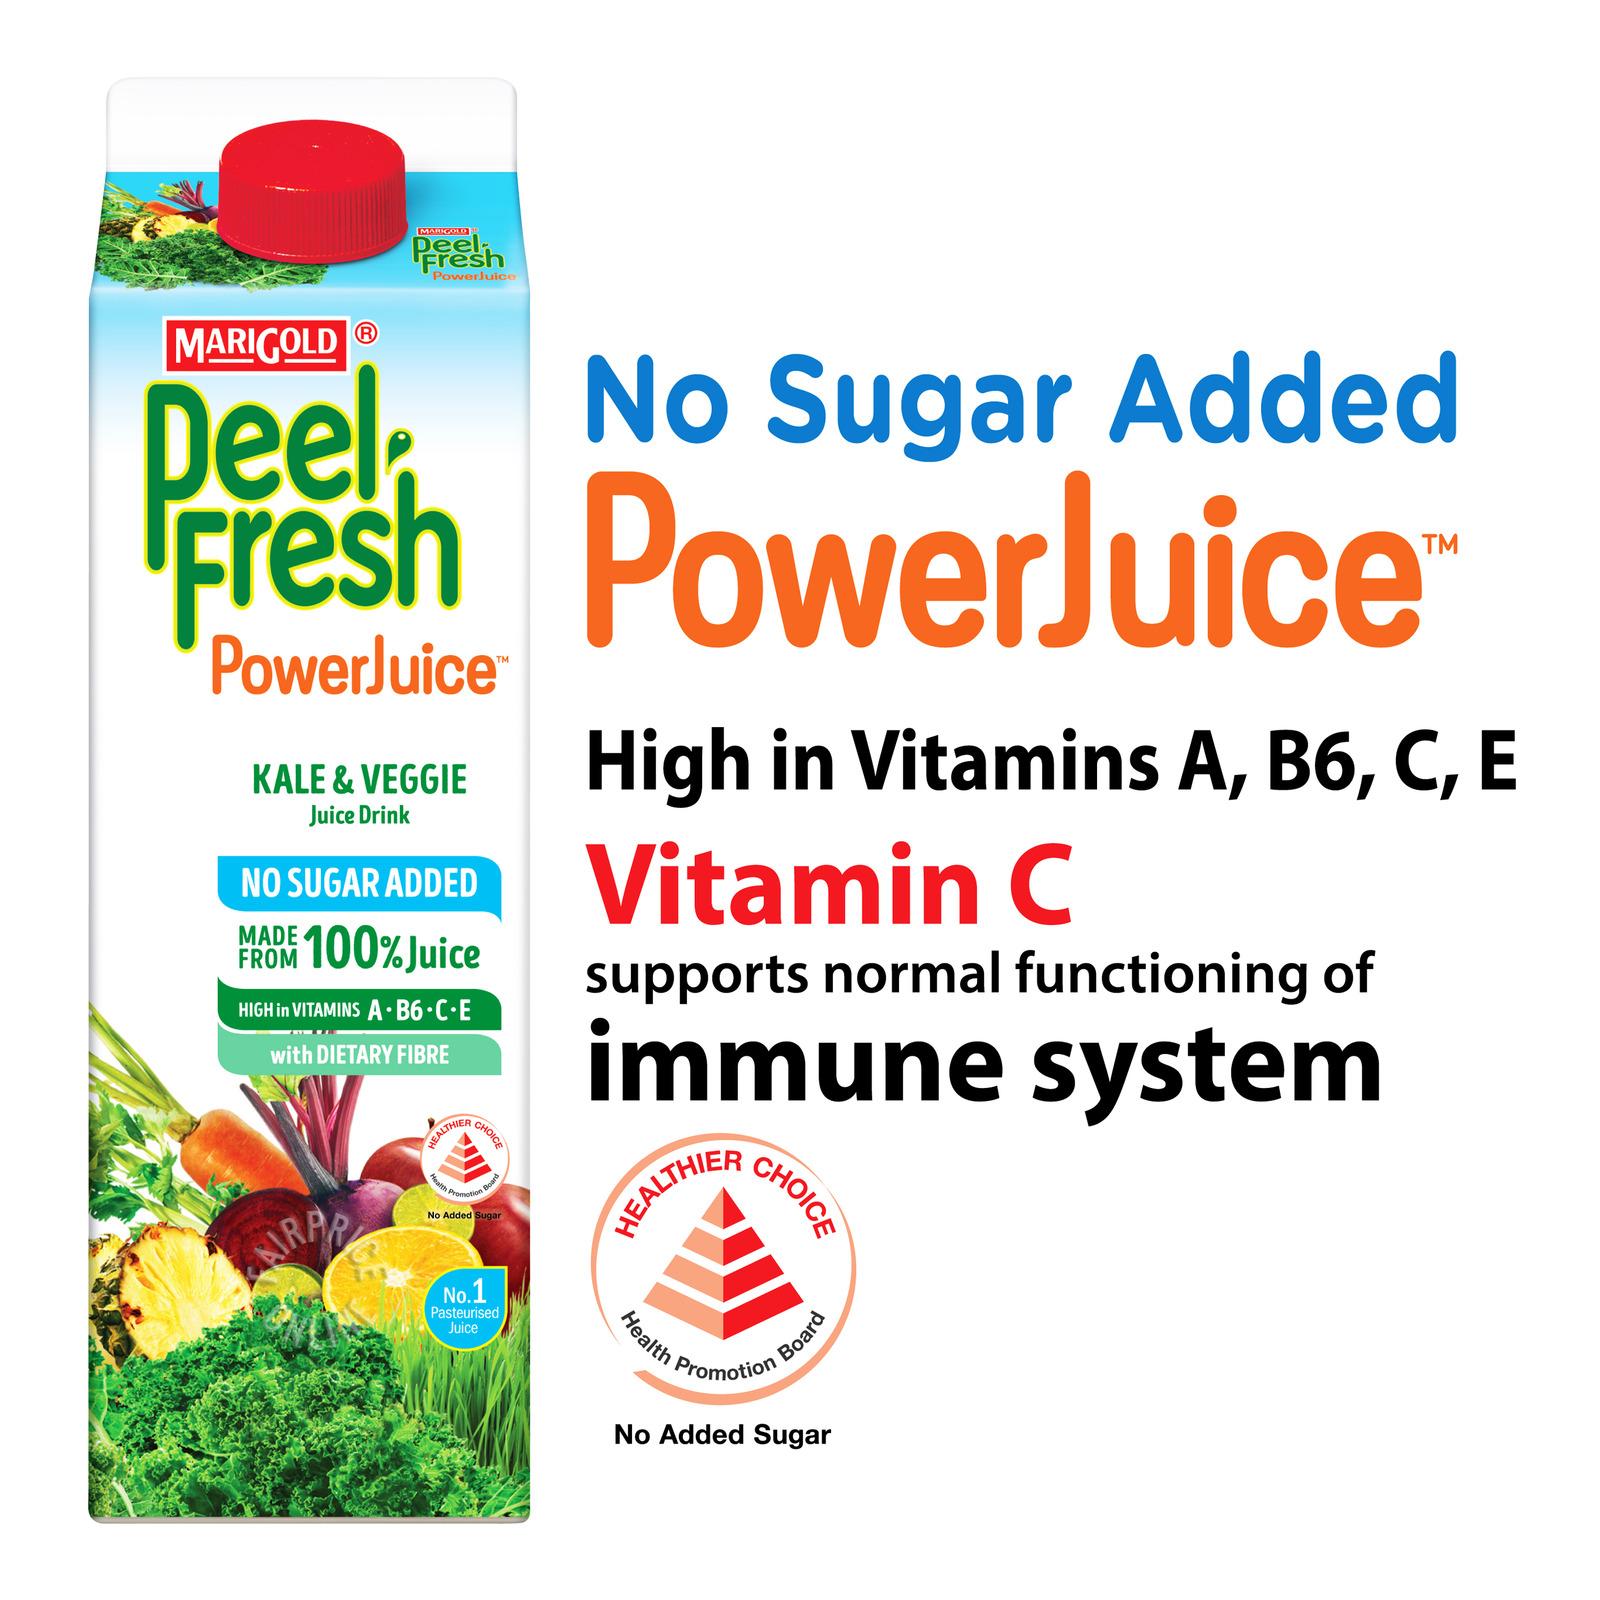 Marigold Peel Fresh Juice - Kale & Veggie (No Sugar)